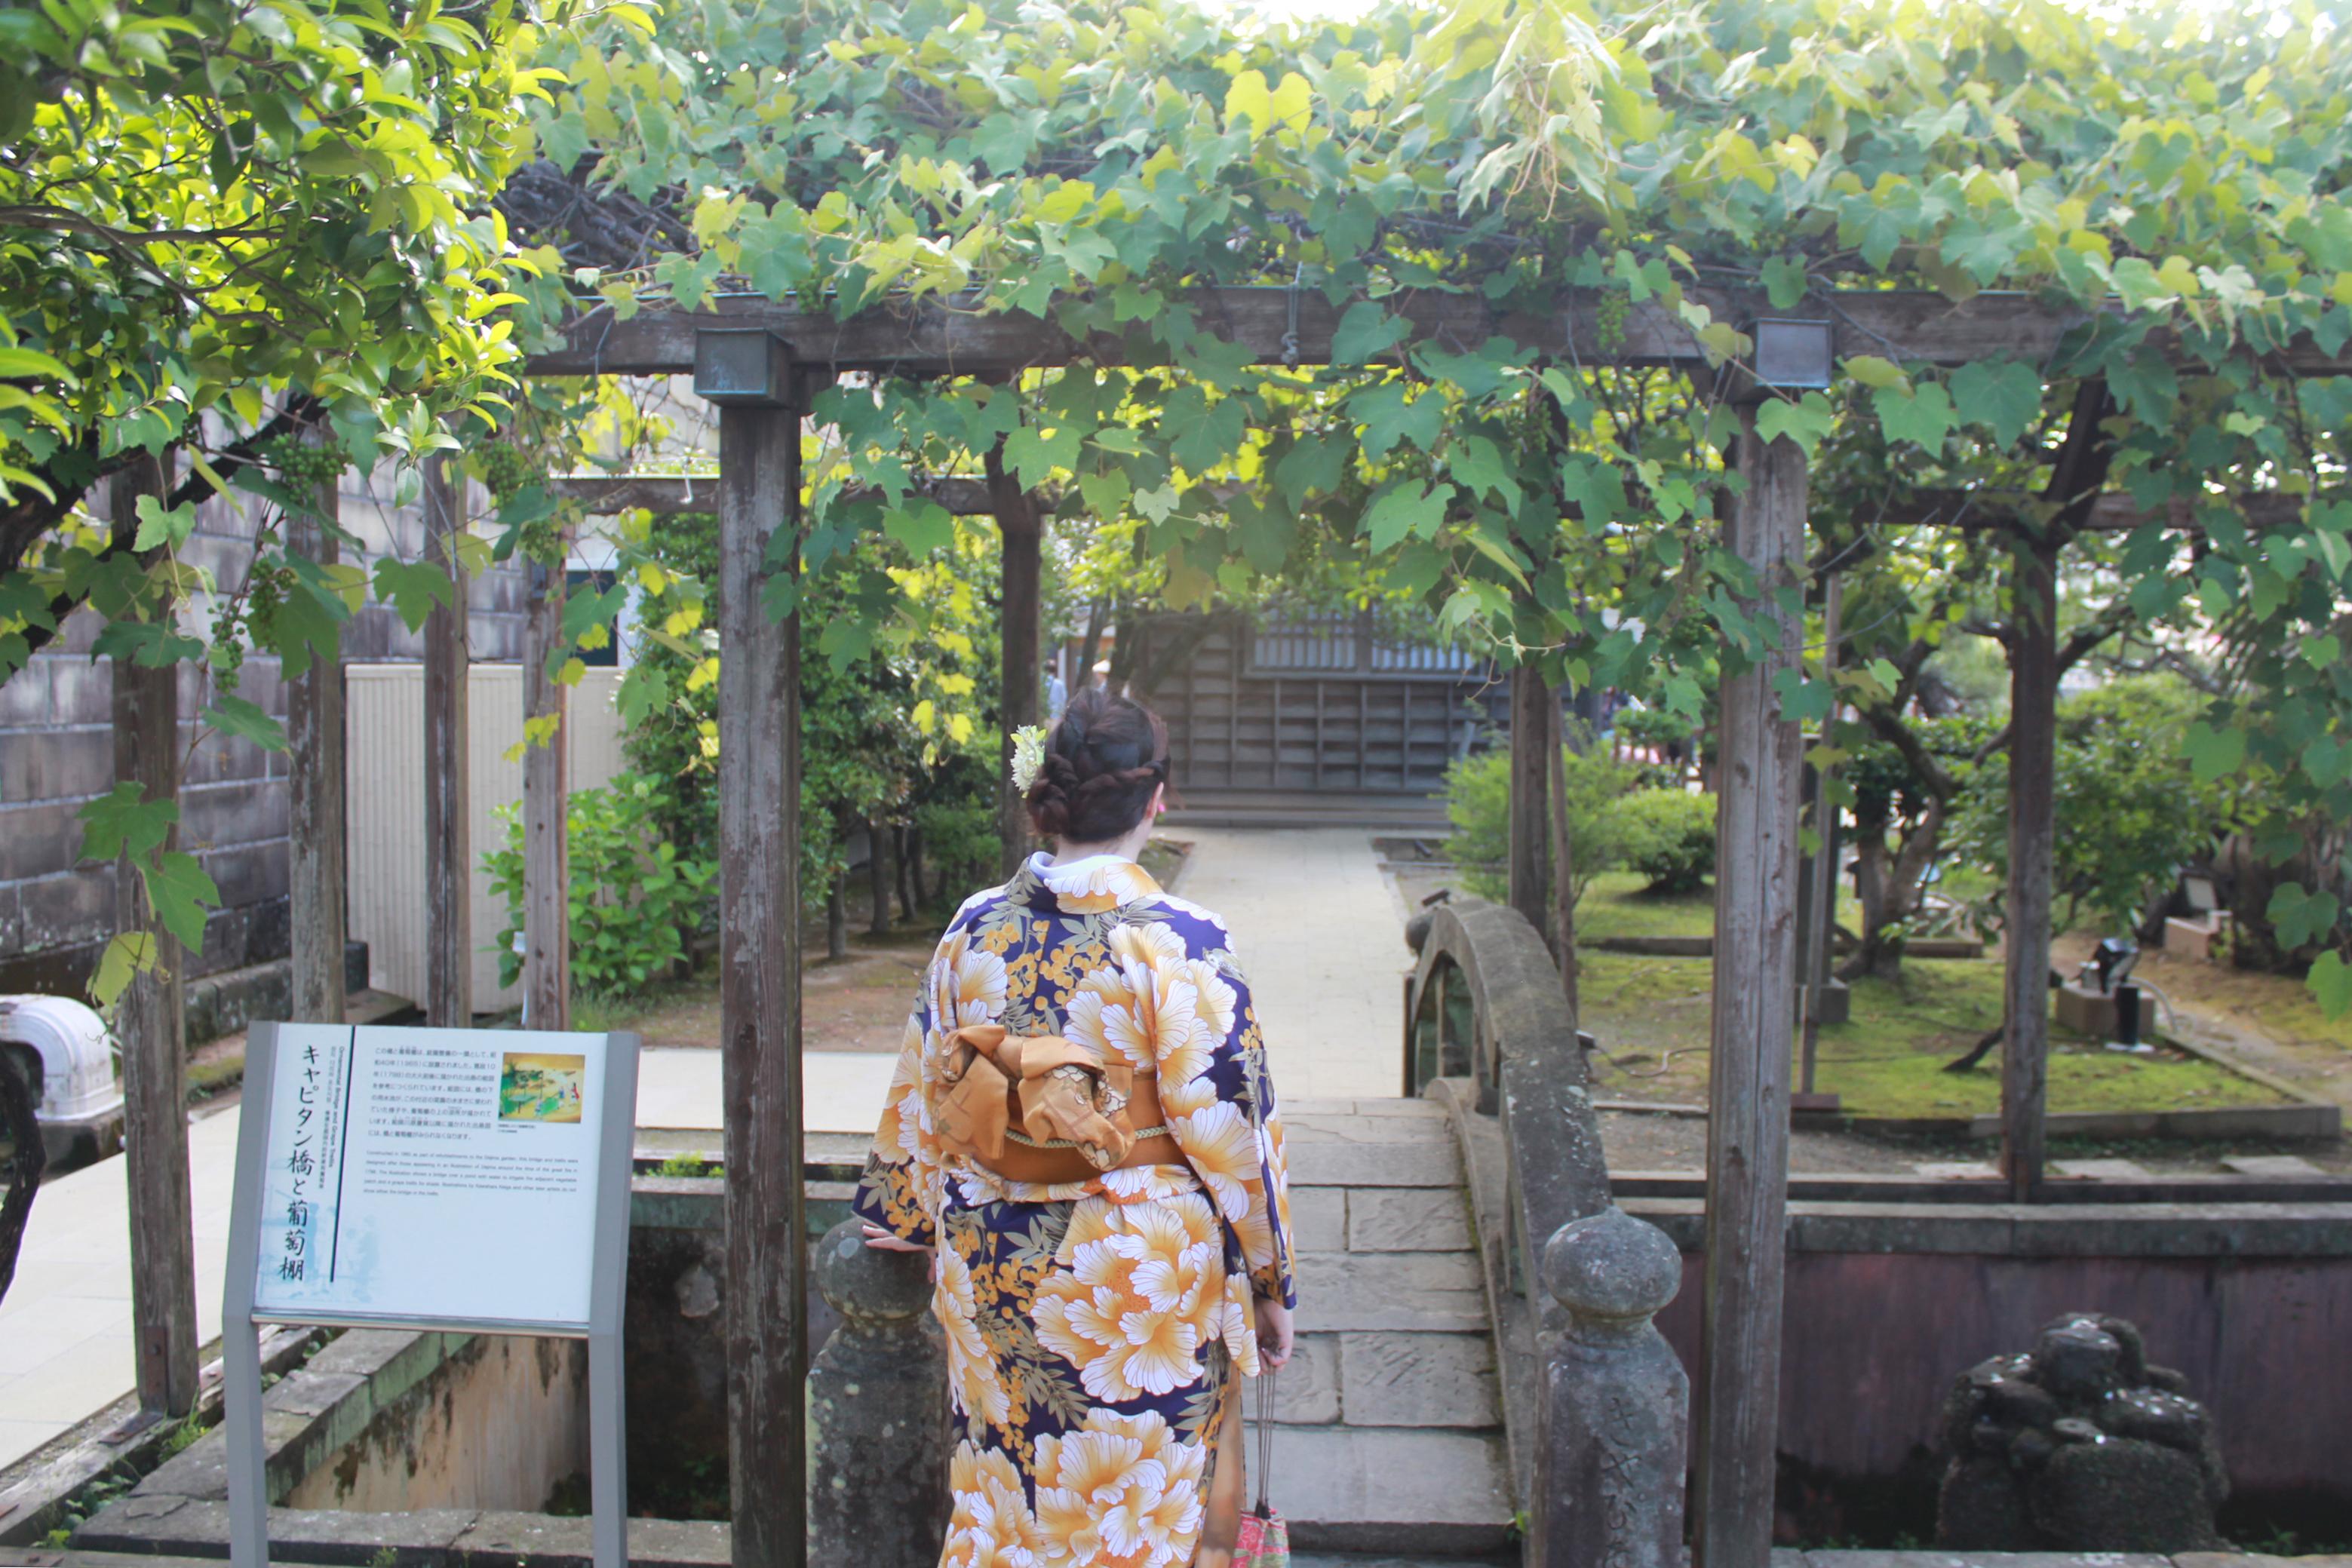 A person in kimono walking on a stone bridge in a garden